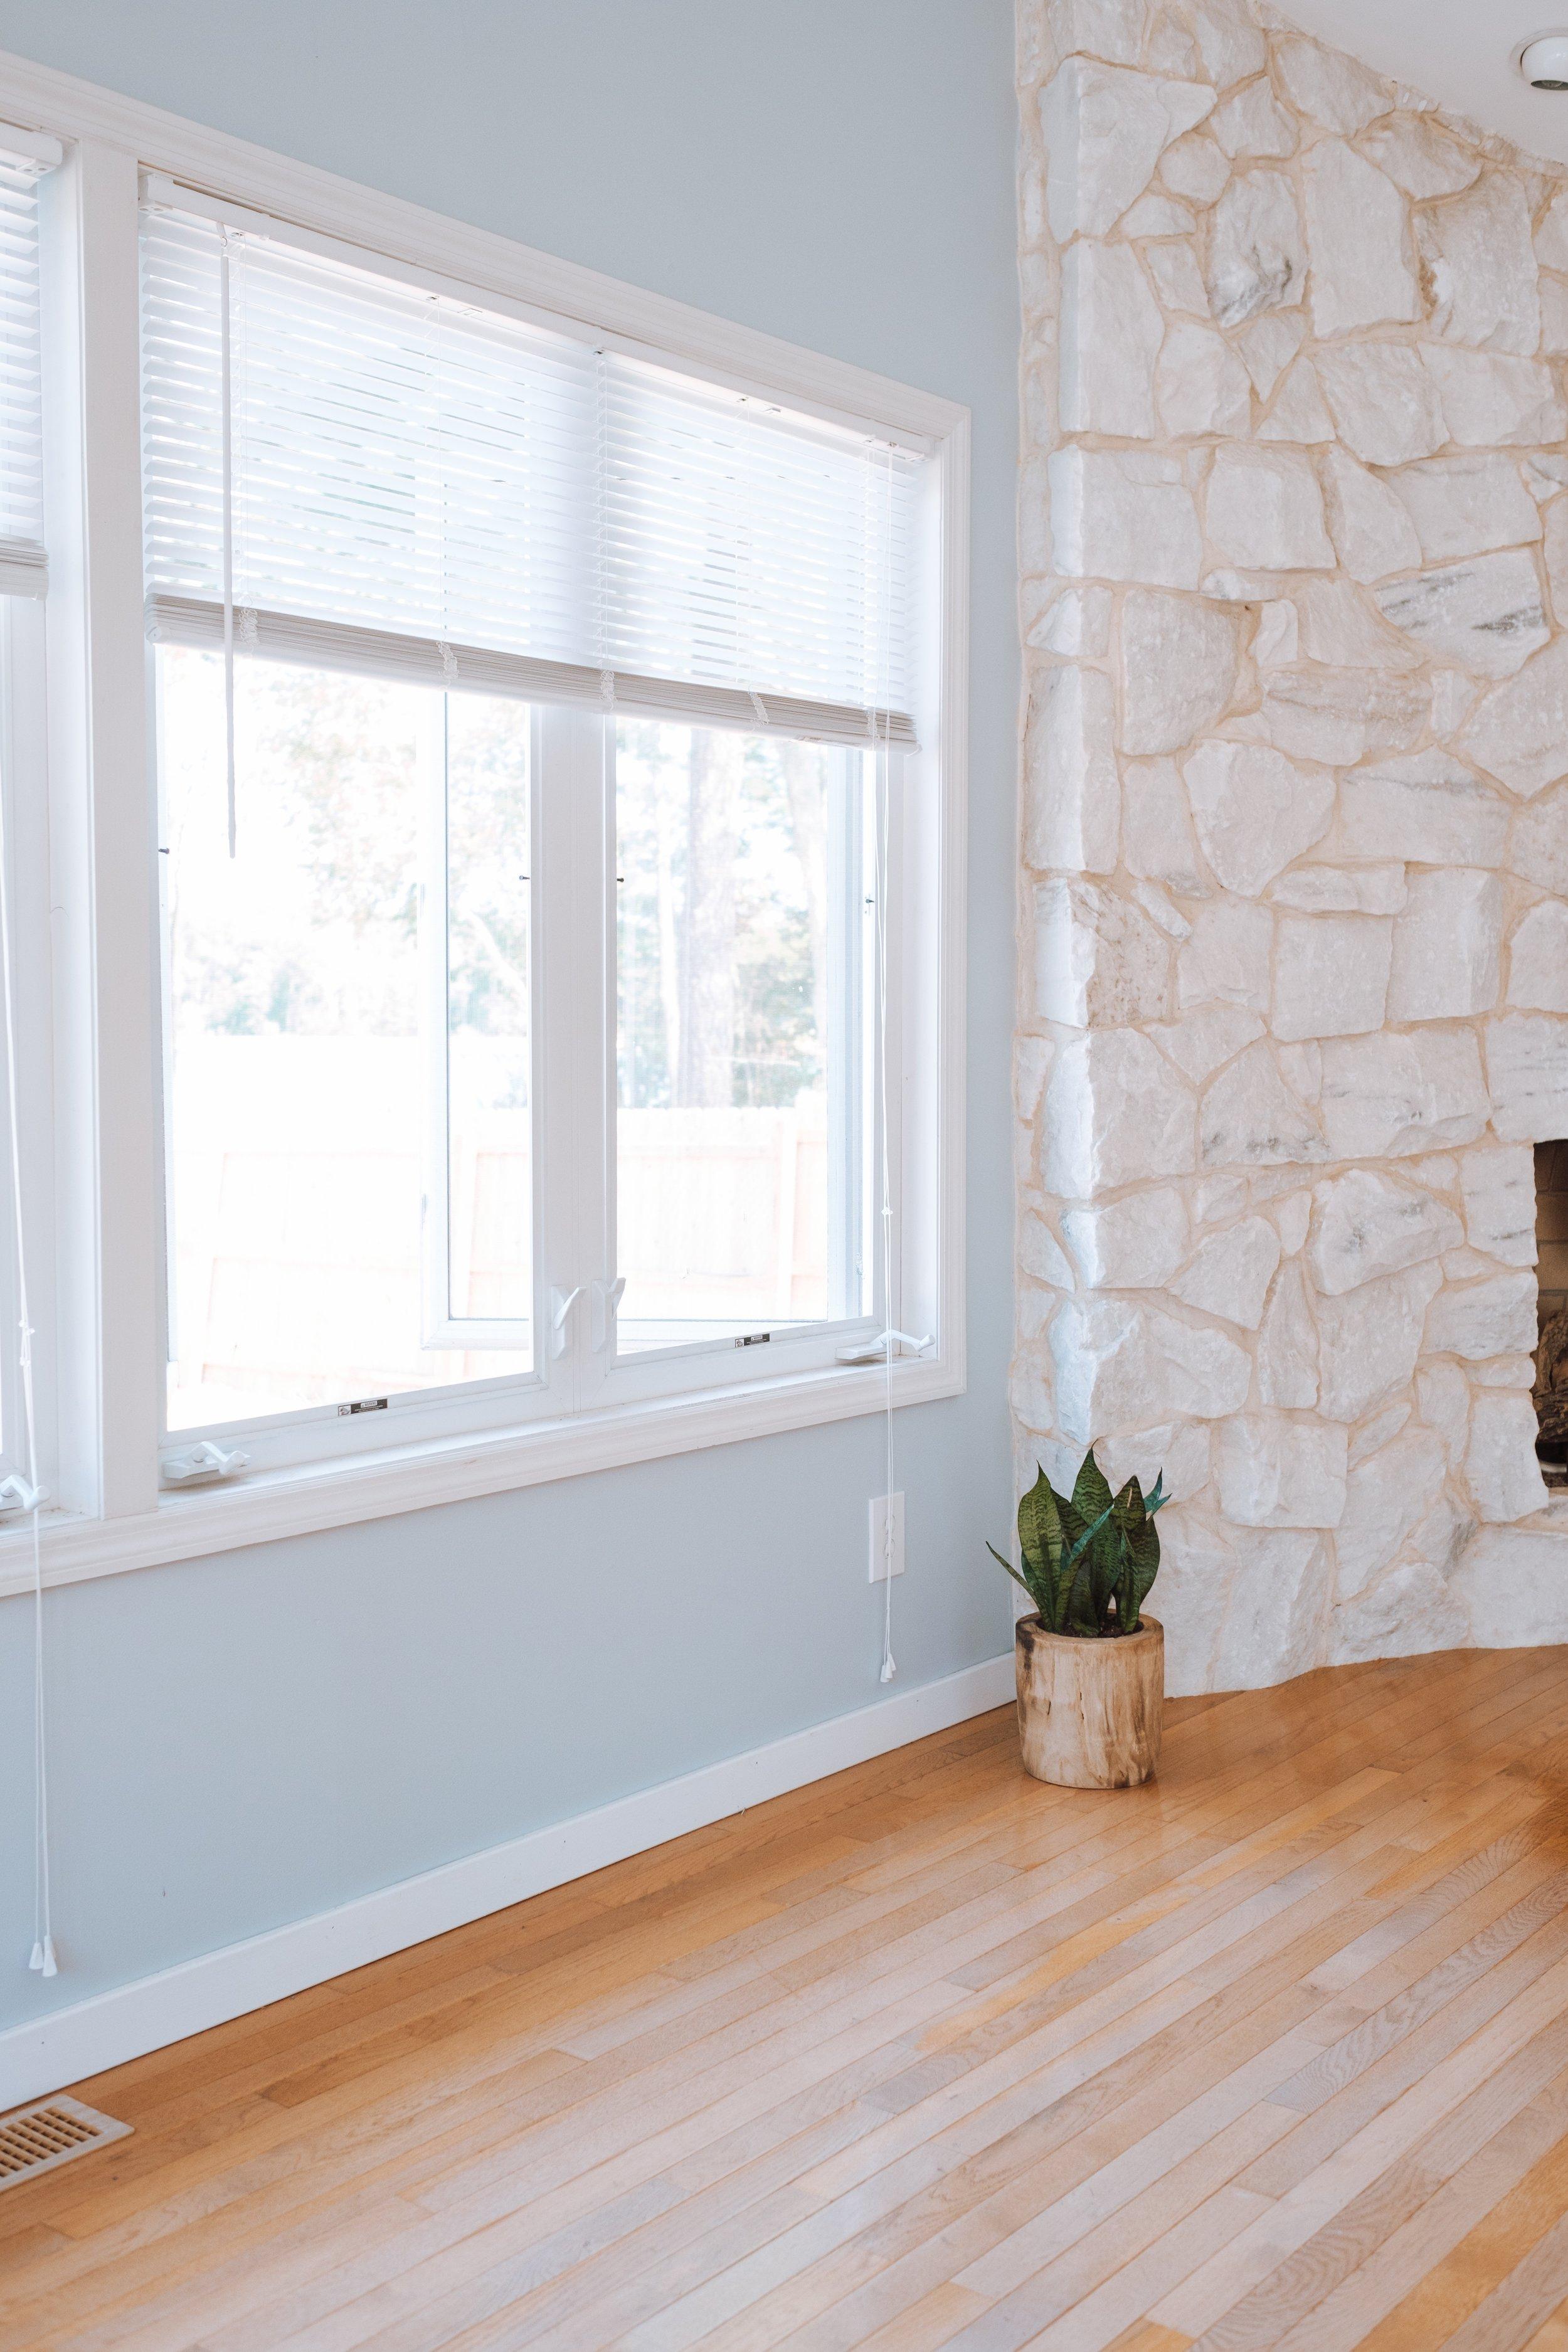 window cleaner slc.jpg